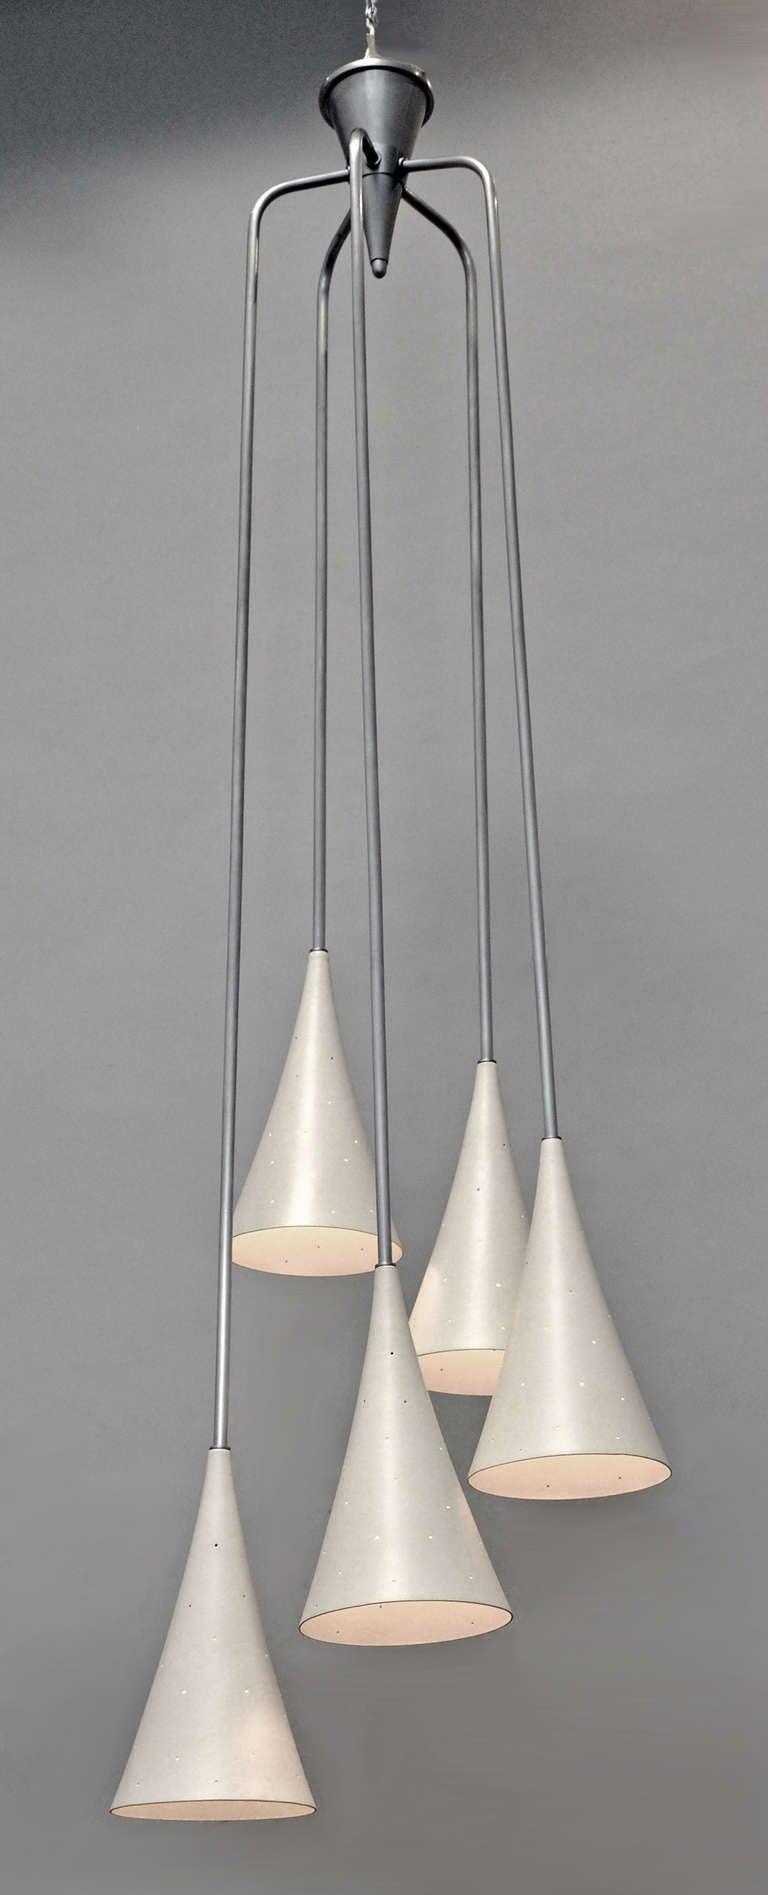 Italian mid century modern hanging lamp at 1stdibs for Mid century modern hanging lamp